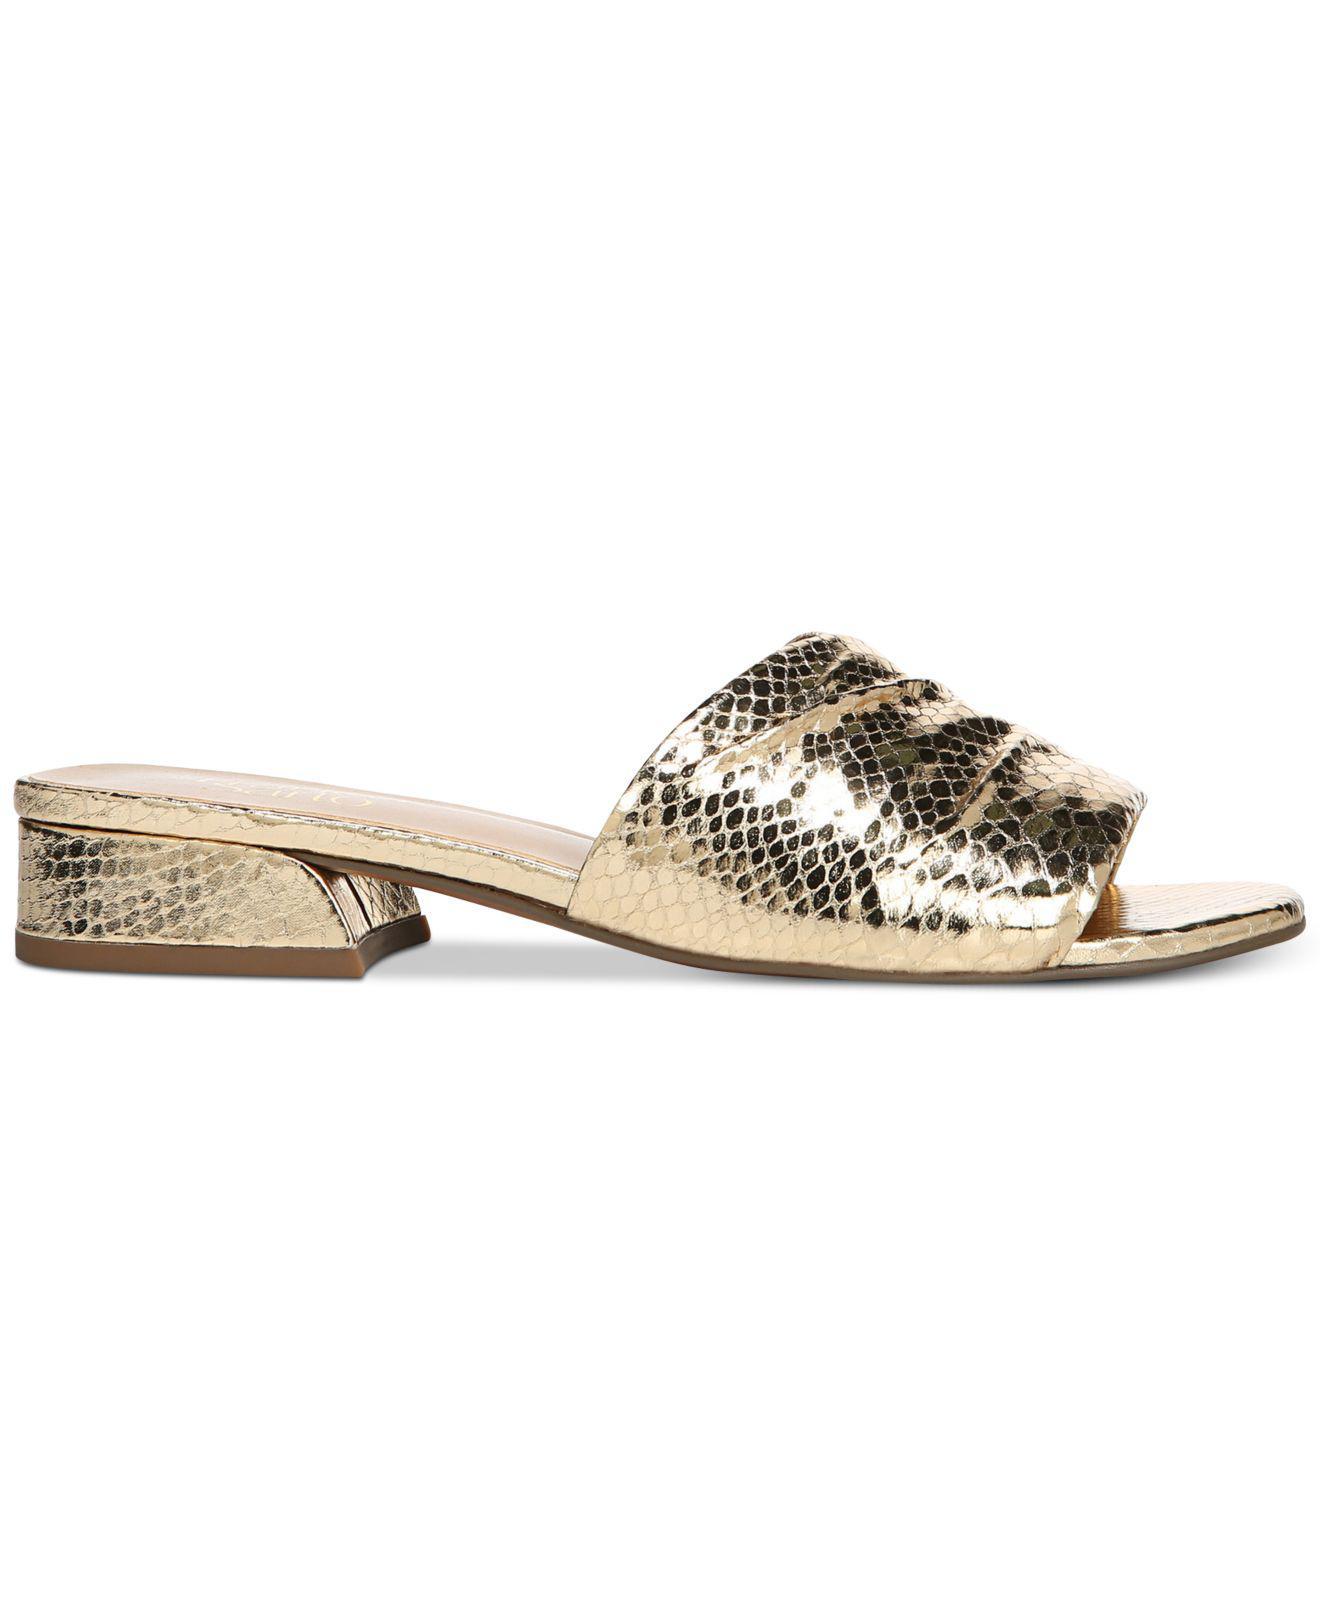 Franco Sarto Frisco Metallic Shiny Snake Print Block Heel Slides aj2gFmVv